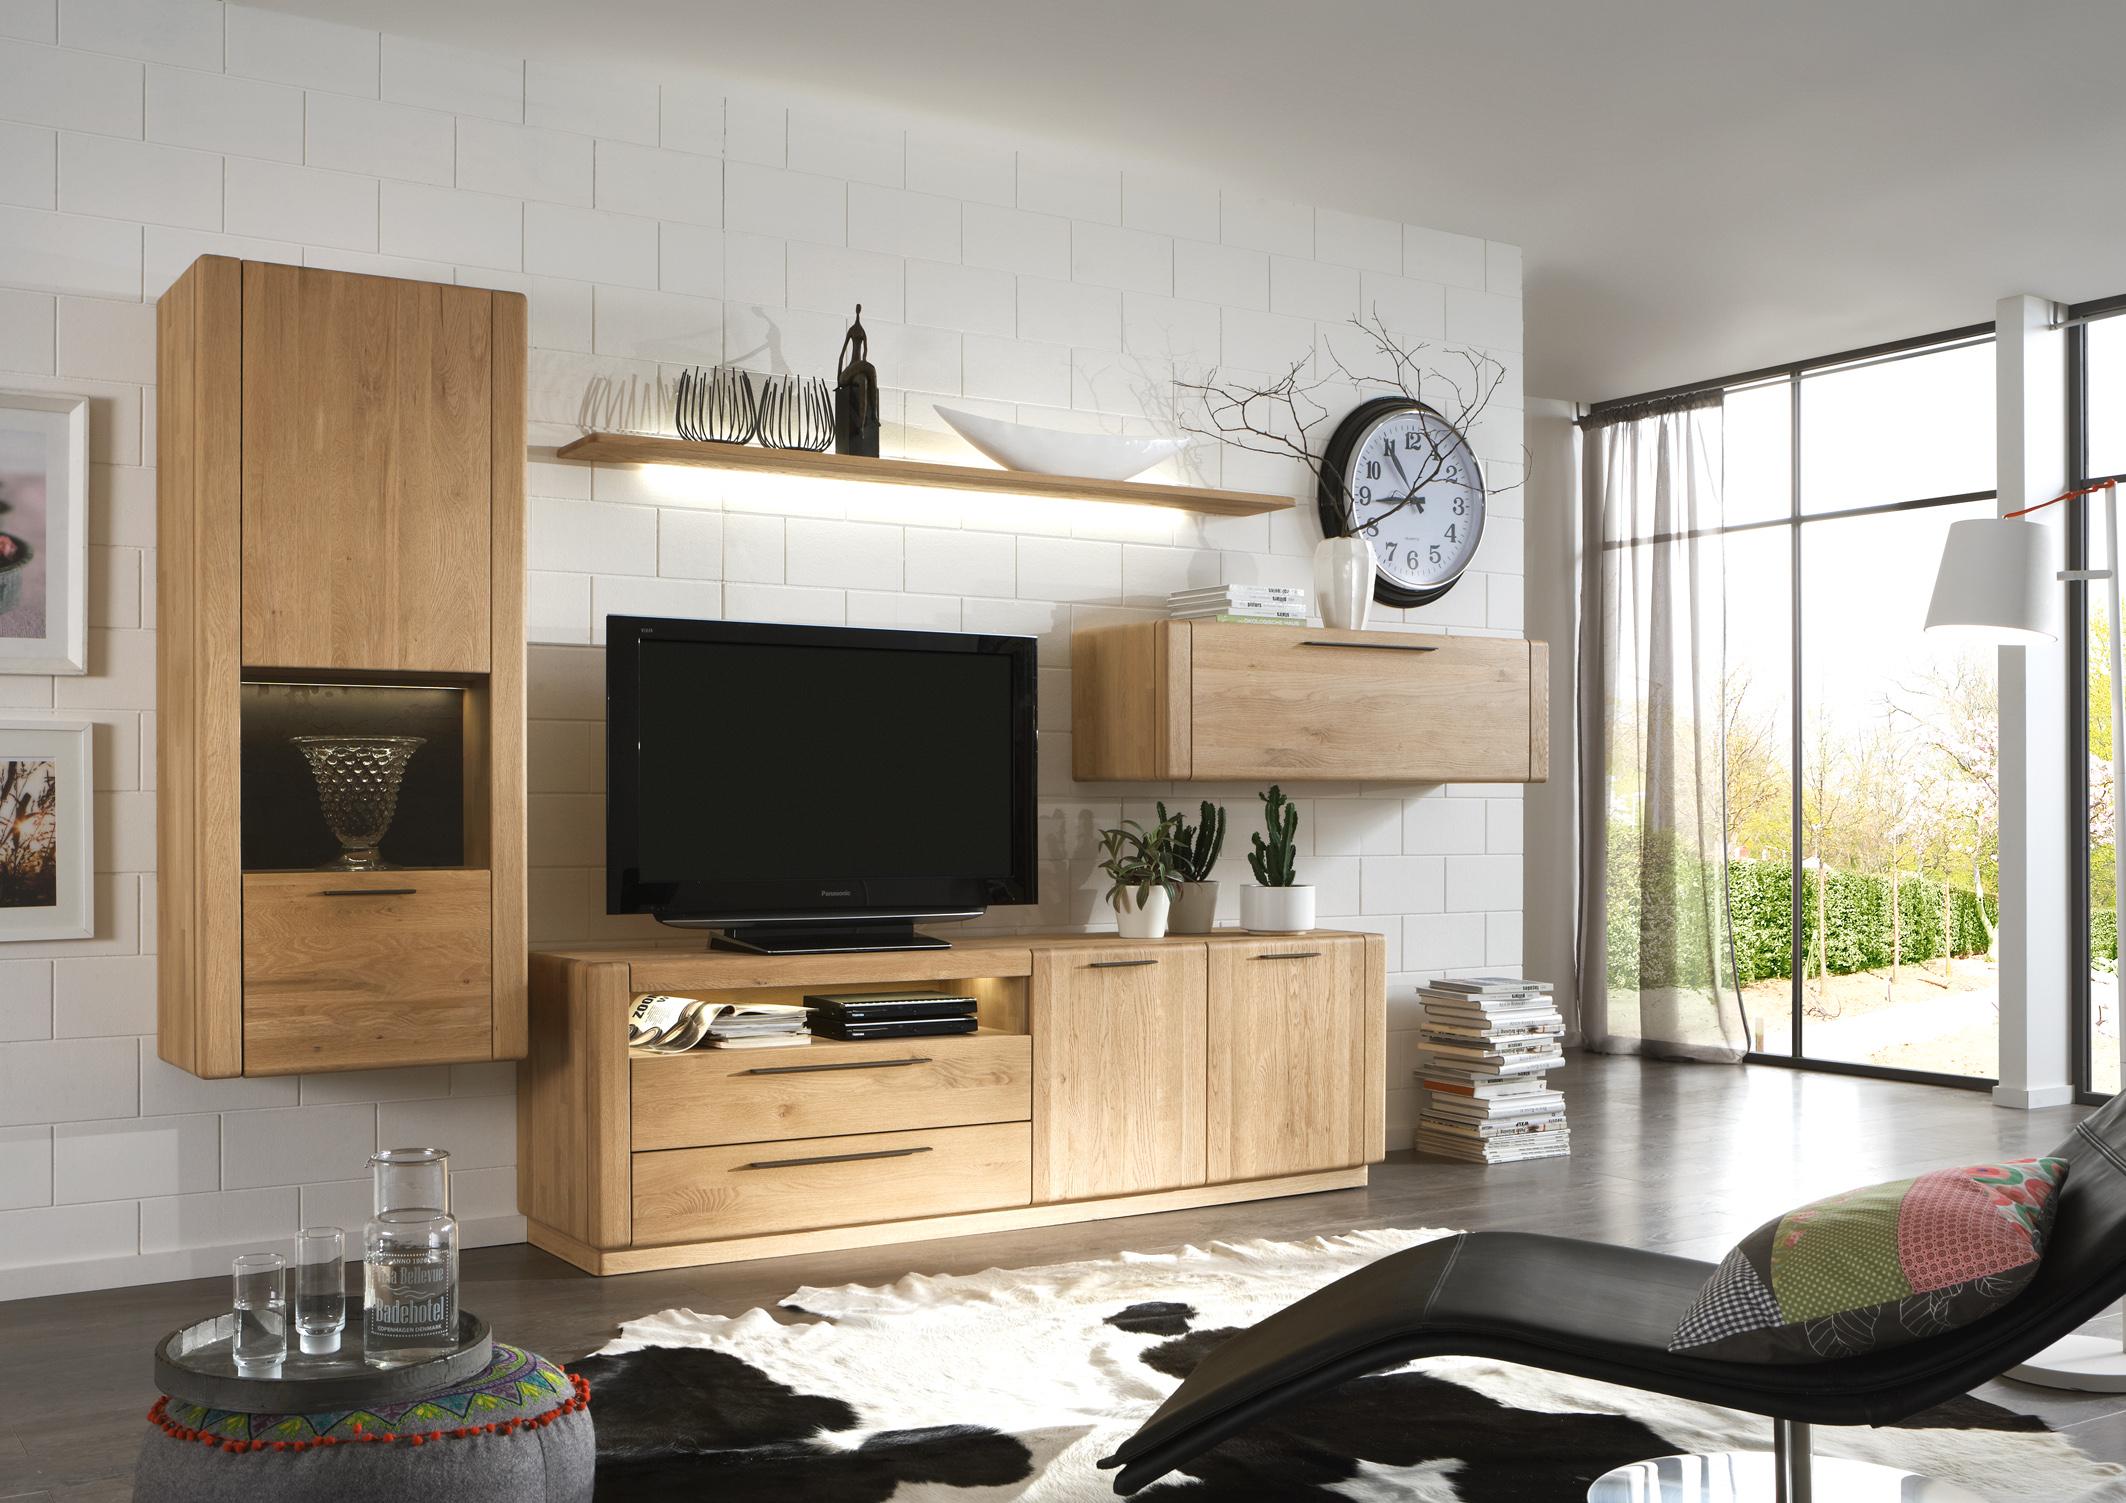 pm 2017 ipm entertainmentsysteme 2. Black Bedroom Furniture Sets. Home Design Ideas